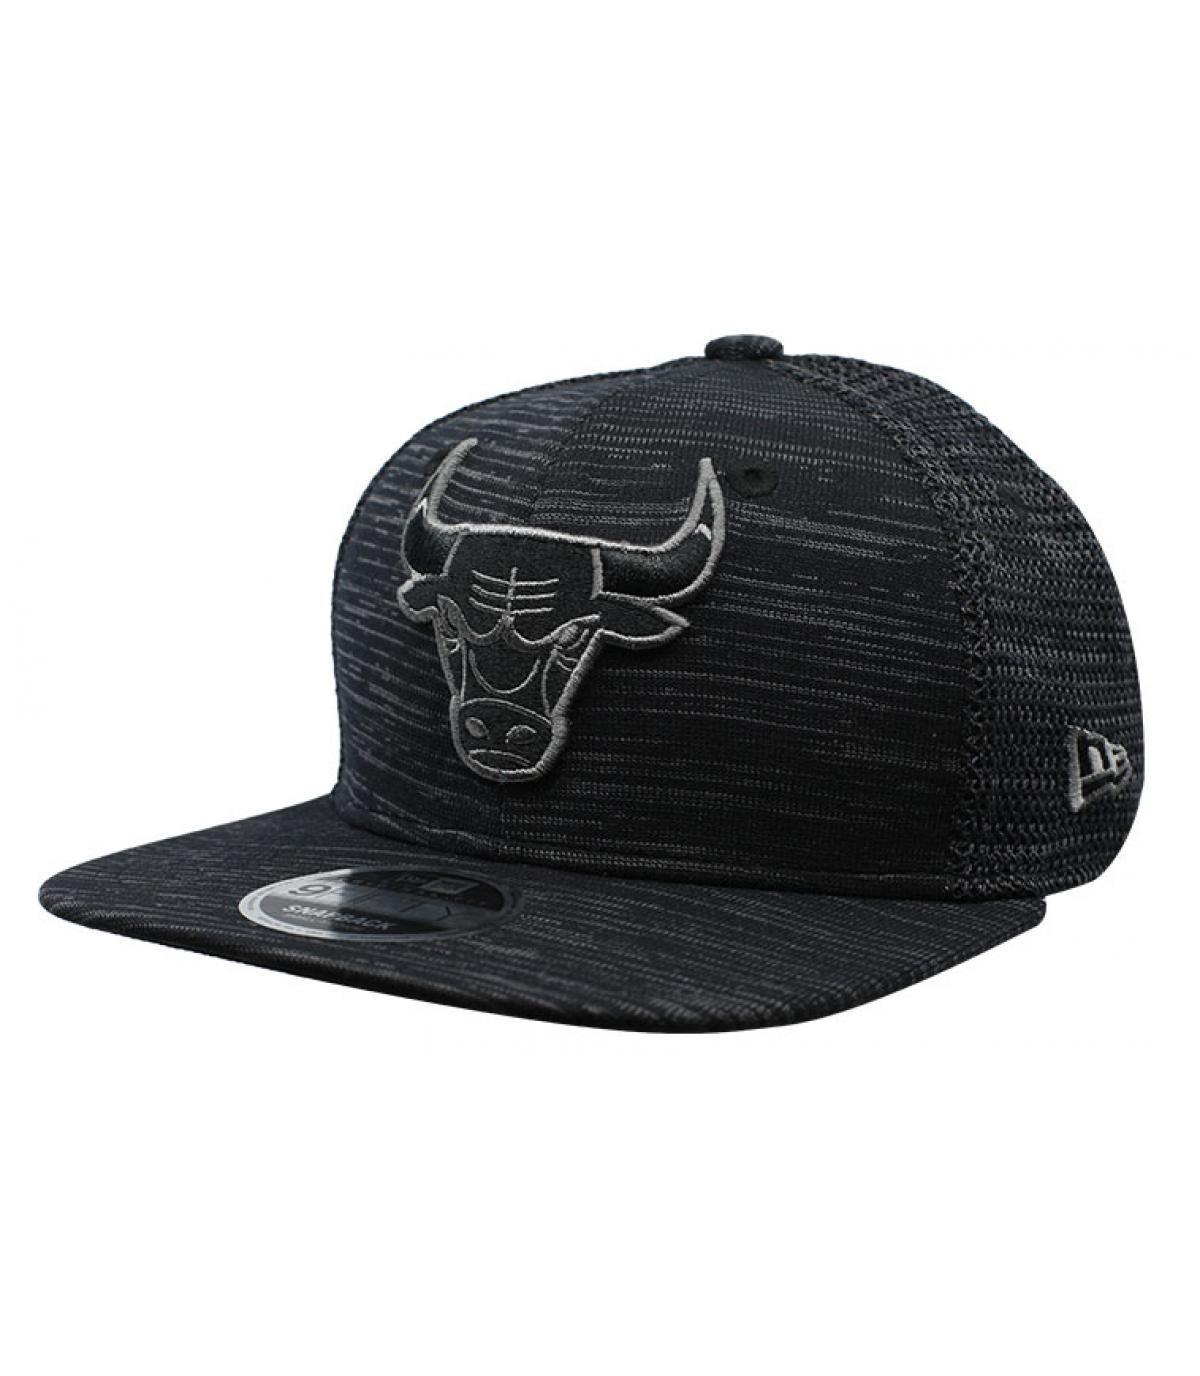 Details Engineered Fit Bulls 9Fifty black - afbeeling 2